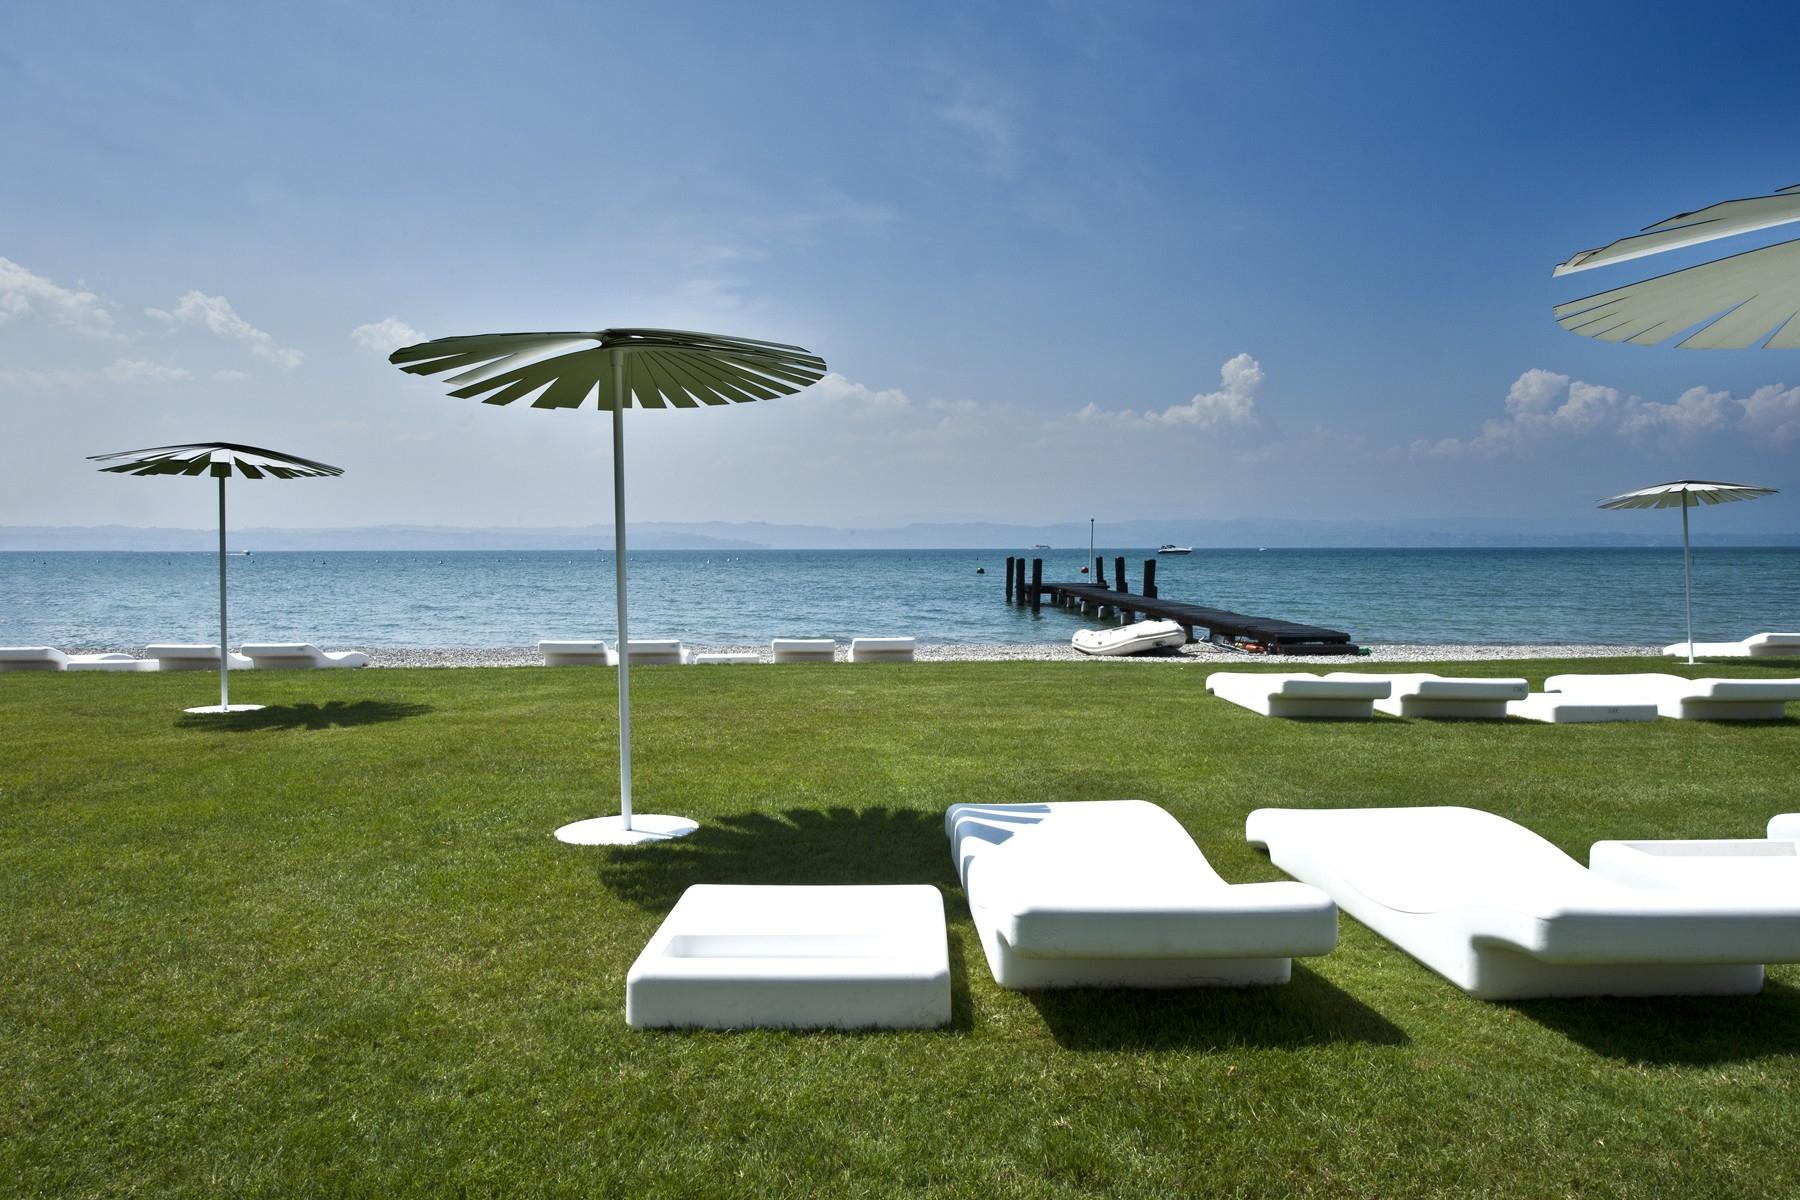 Villa in Vendita a Sirmione: 5 locali, 550 mq - Foto 15